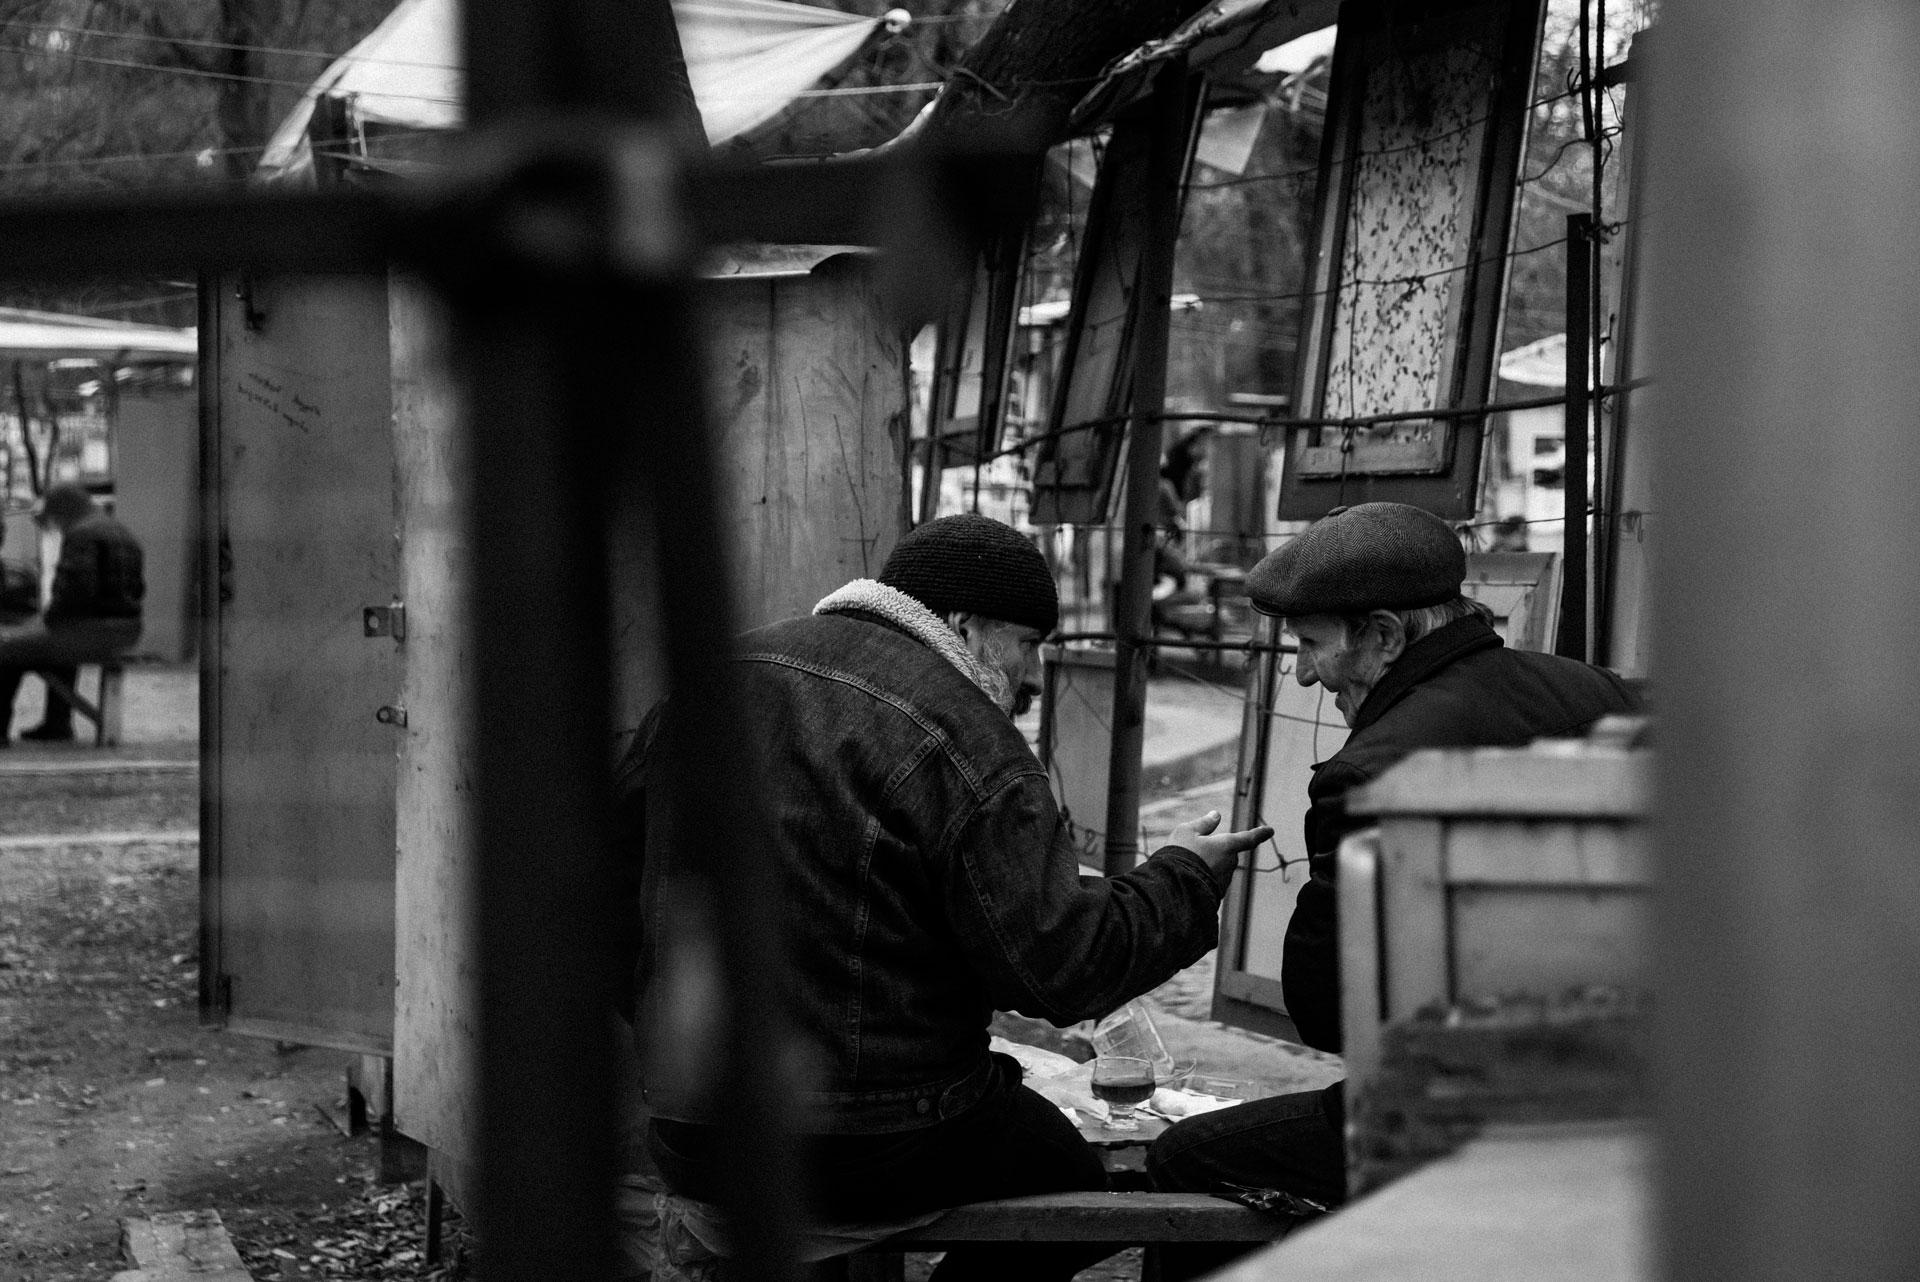 tbilisi-georgia-black-and-white-photography-men.jpg